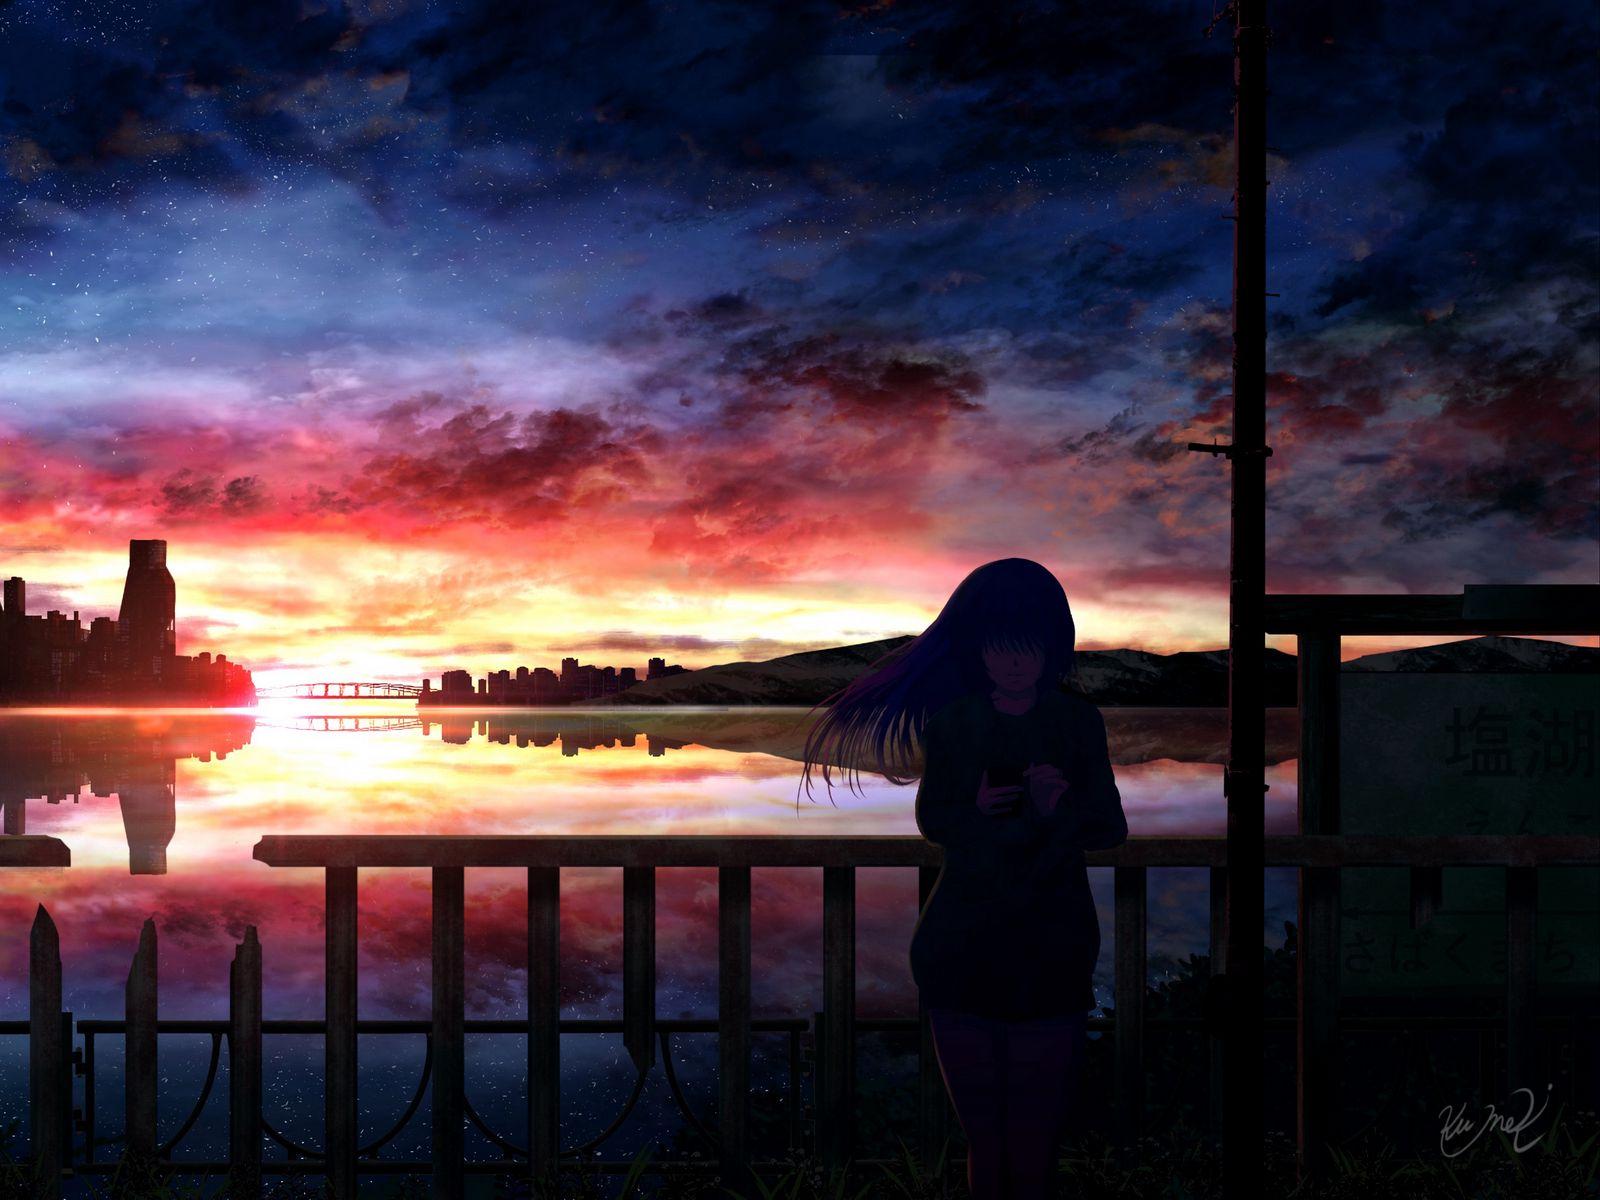 1600x1200 Wallpaper silhouette, night, starry sky, girl, anime